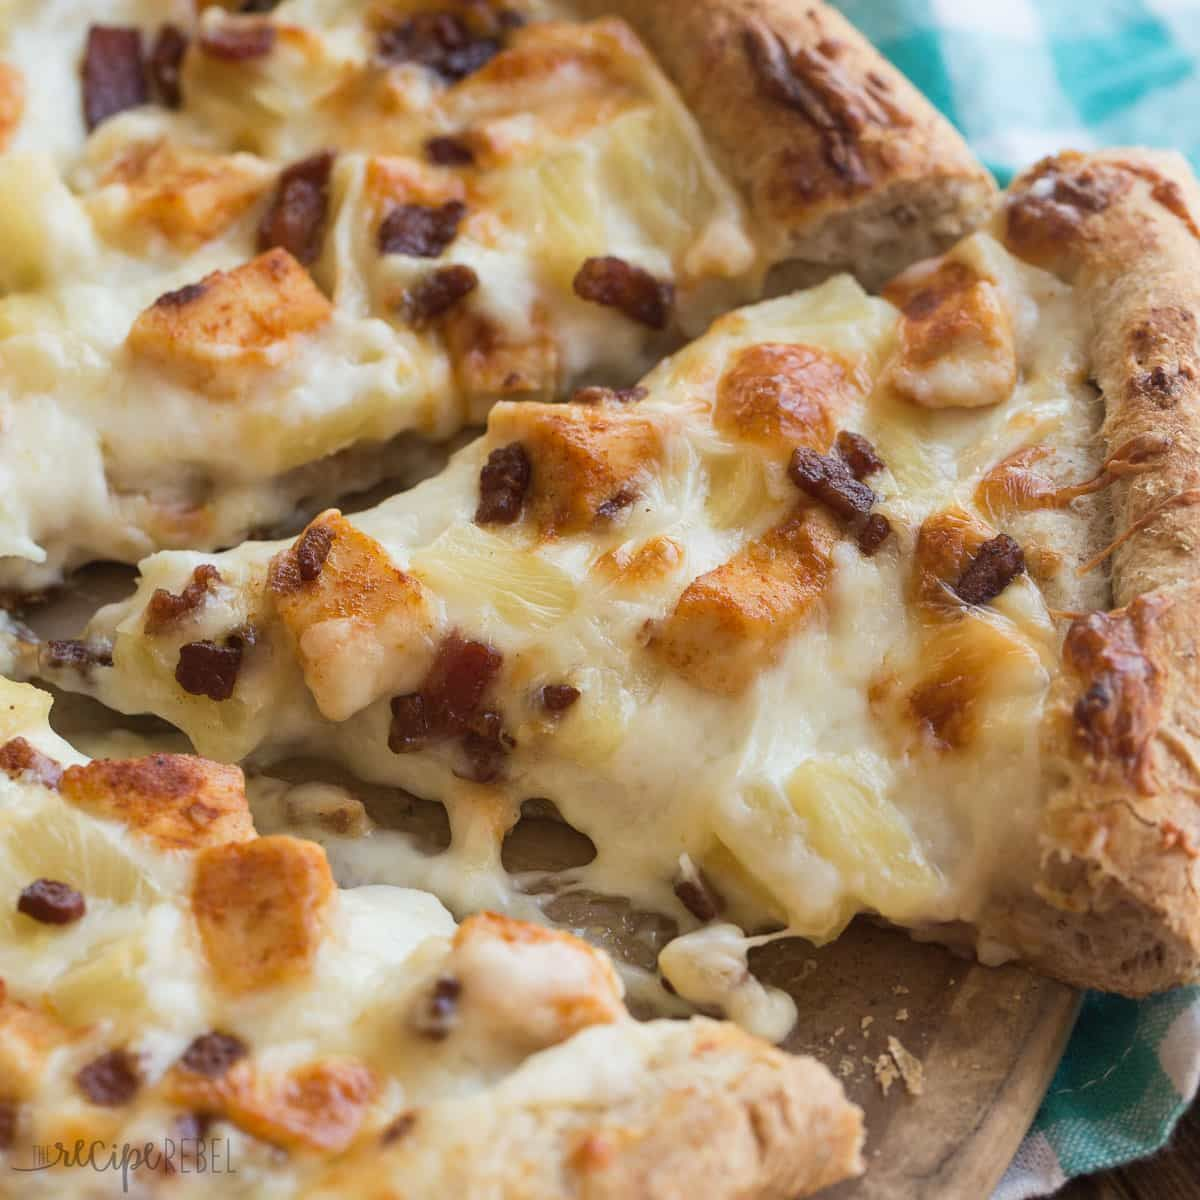 Boston Pizza Copycat Tropical Chicken Pizza Has Alfredo Sauce Spicy Chicken Bacon And Pineapple A Crazy Bu Chicken Pizza Recipes Pizza Recipes Chicken Pizza